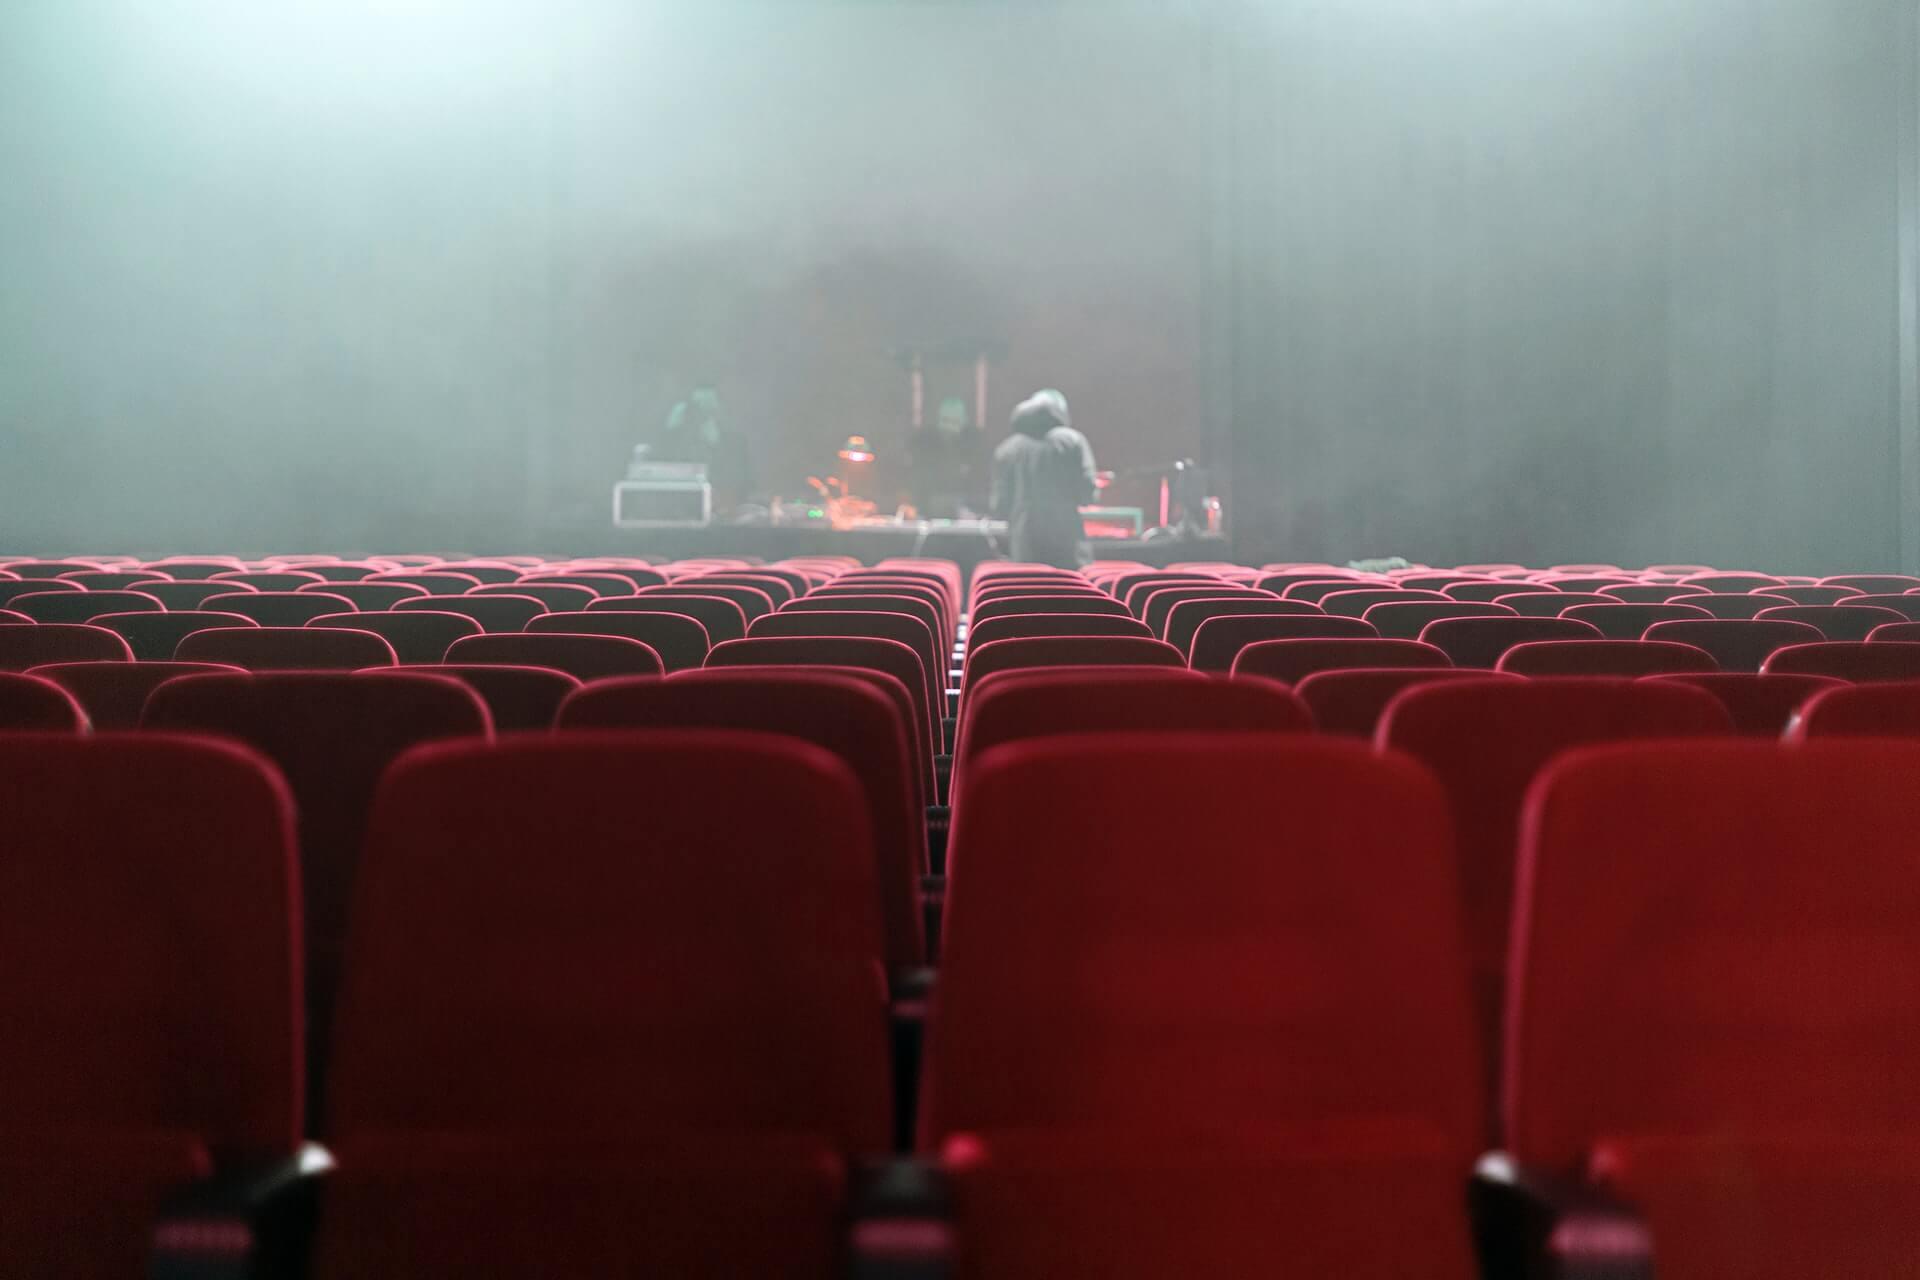 Adbourne Film Festival